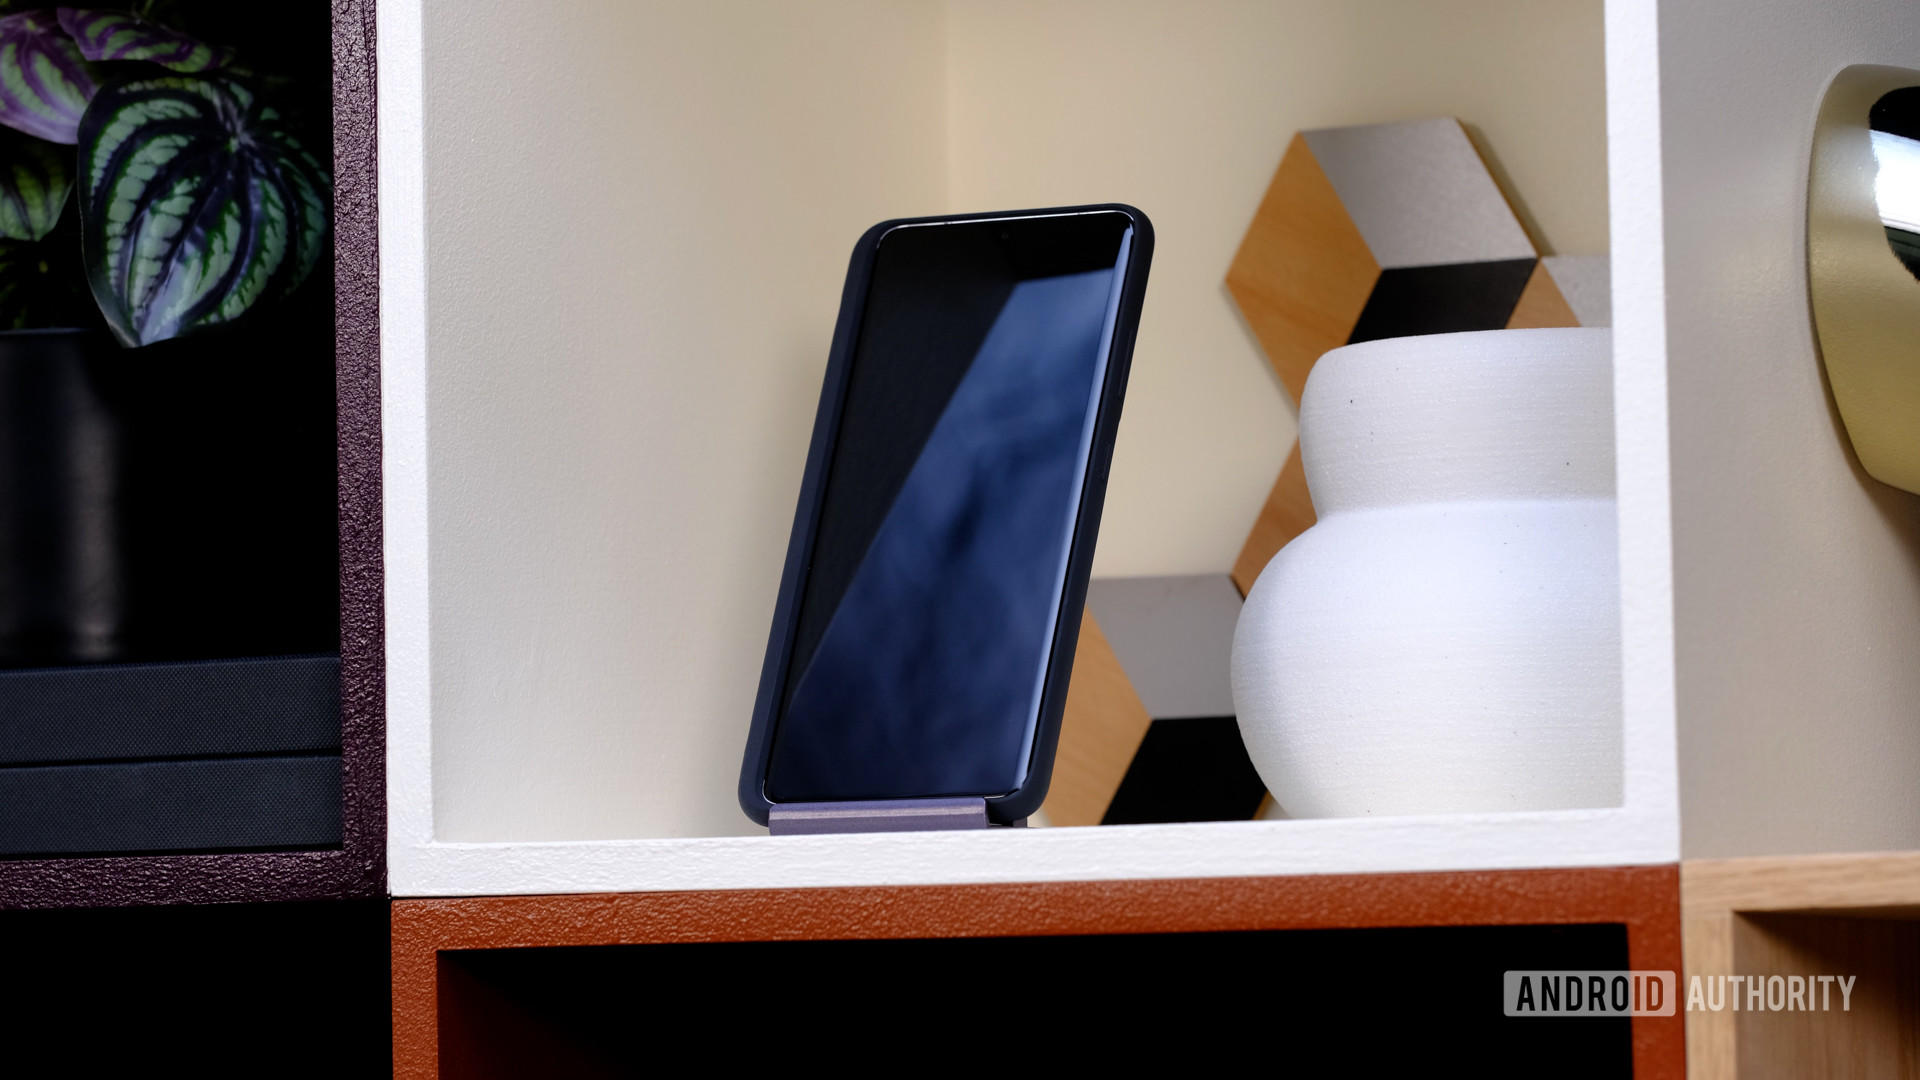 Samsung Galaxy S21 Plus screen off